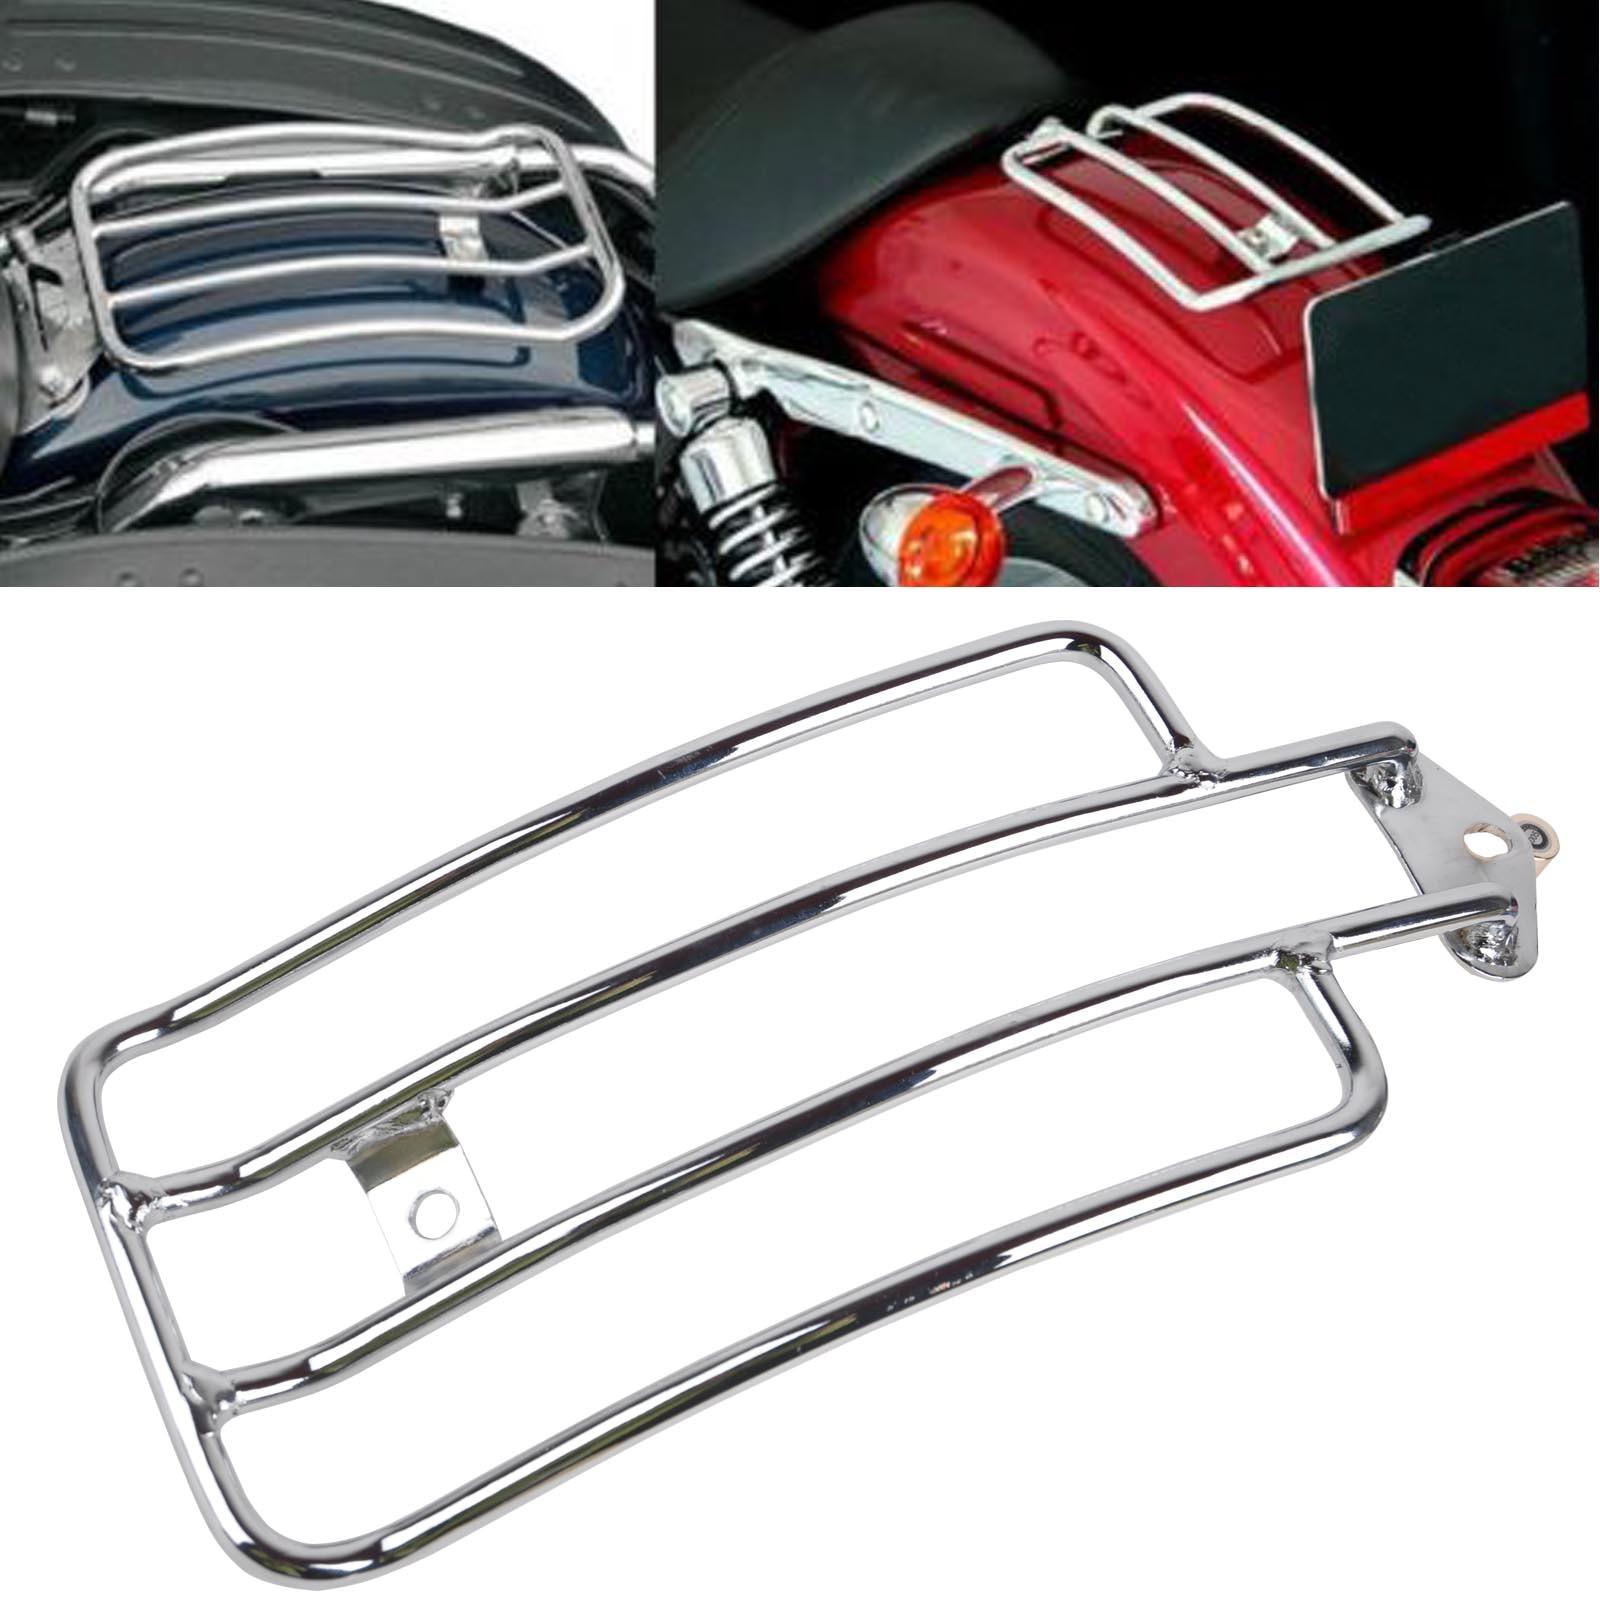 High Grade Metal Steel Solo Seat Rear Fender Luggage Rack Sportster Support Shelf for Honda Yamaha